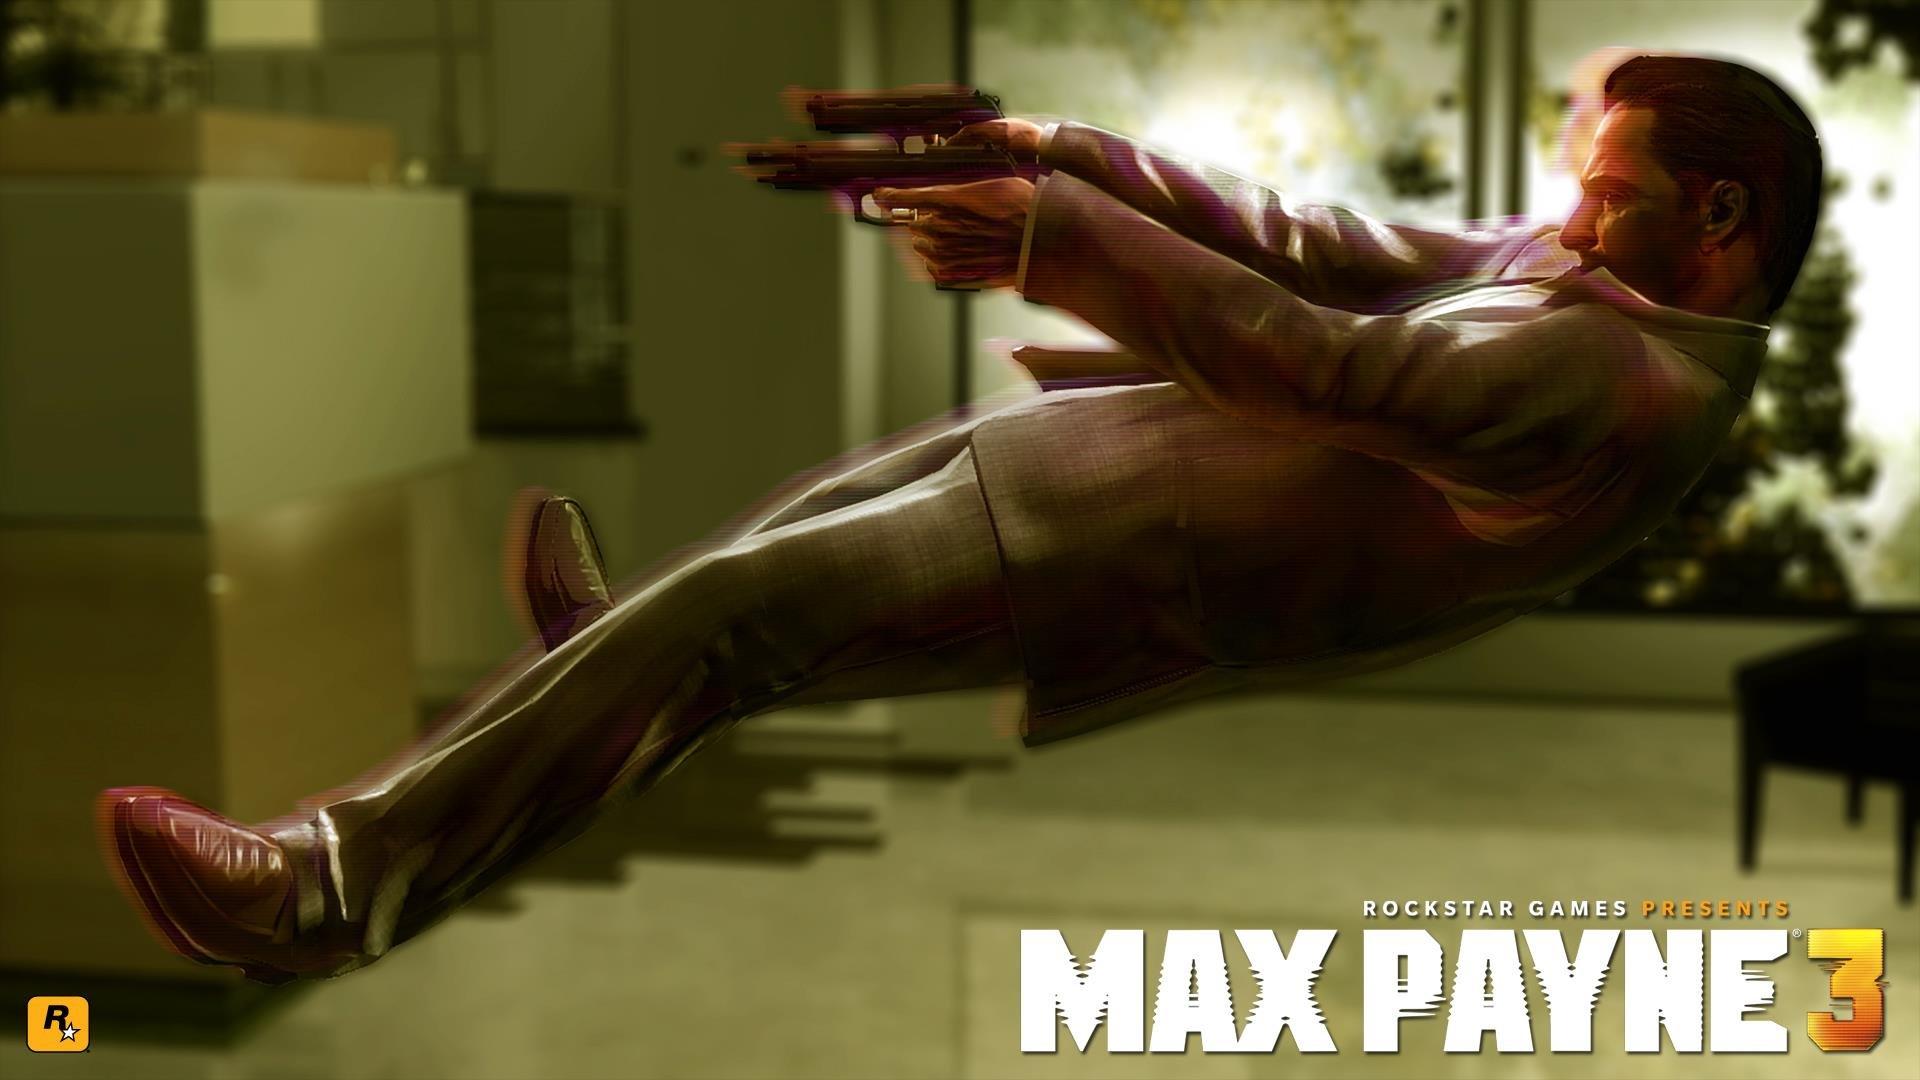 Max Payne 3 Wallpapers 1920x1080 Full Hd 1080p Desktop Backgrounds